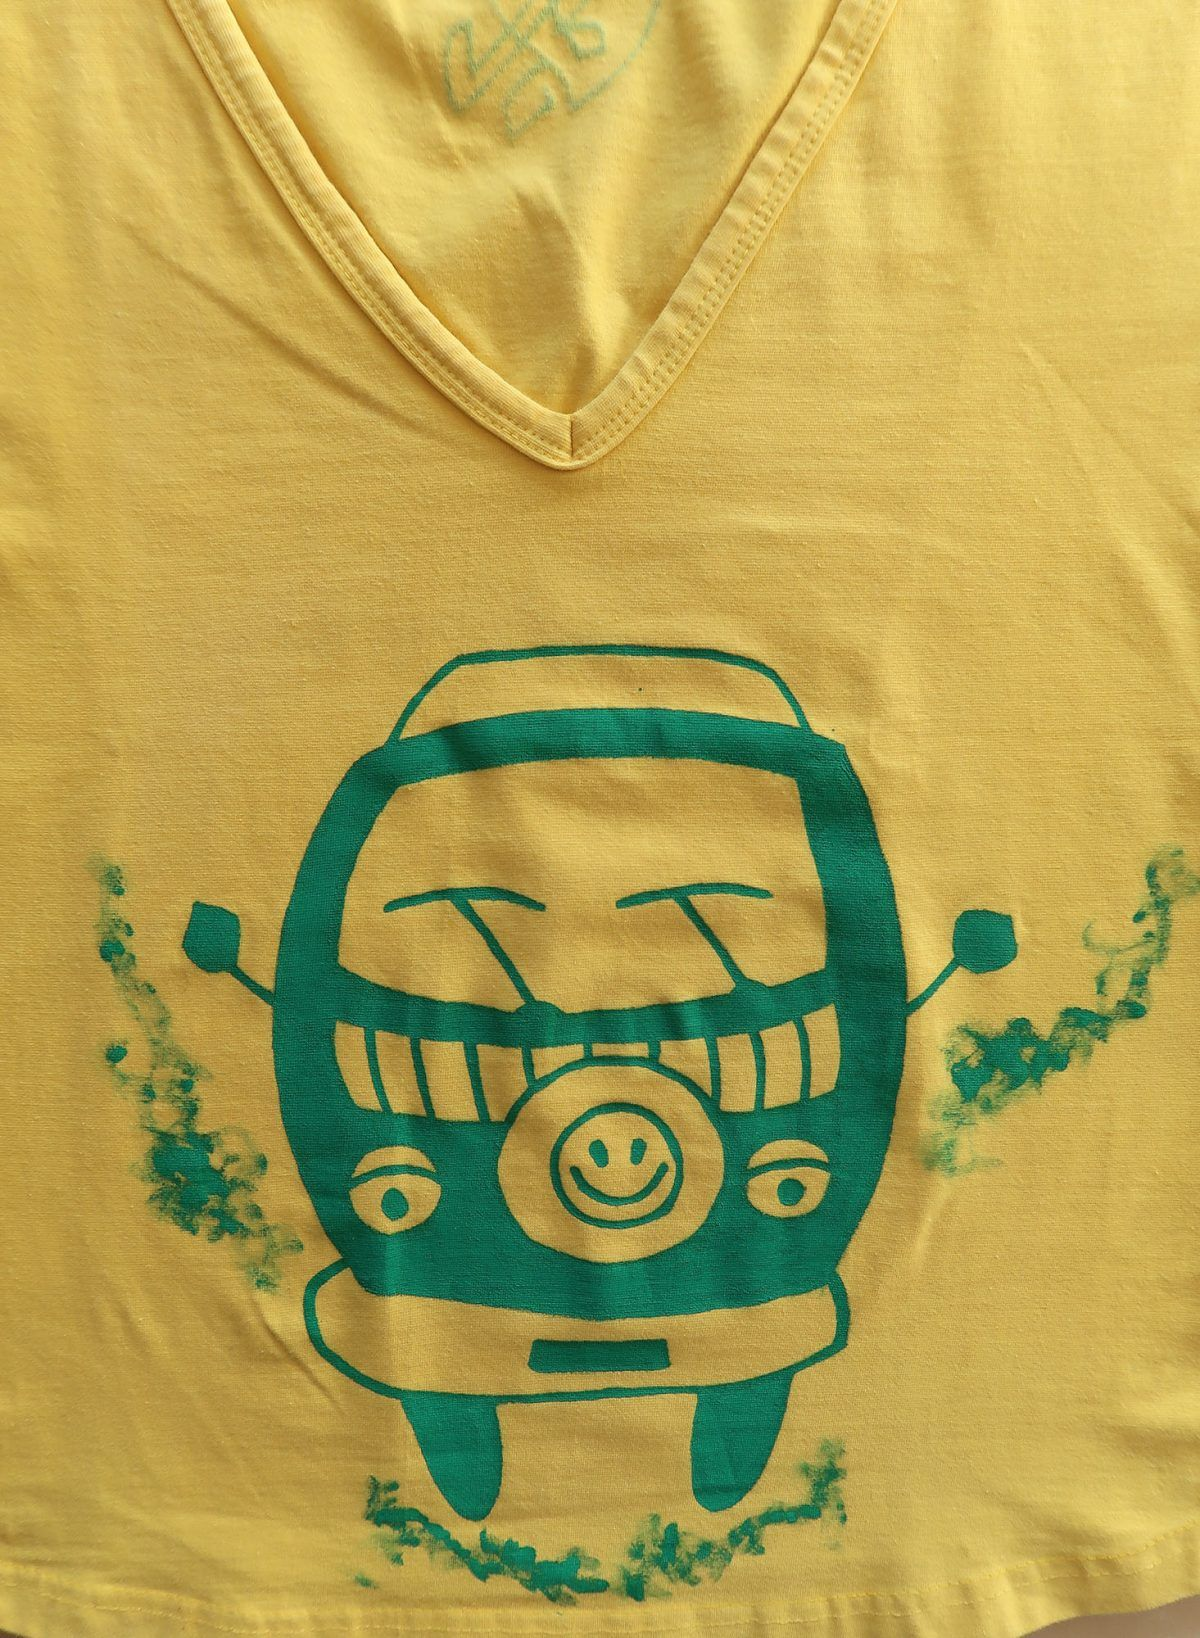 Camiseta pintada a mano-furgoneta camper